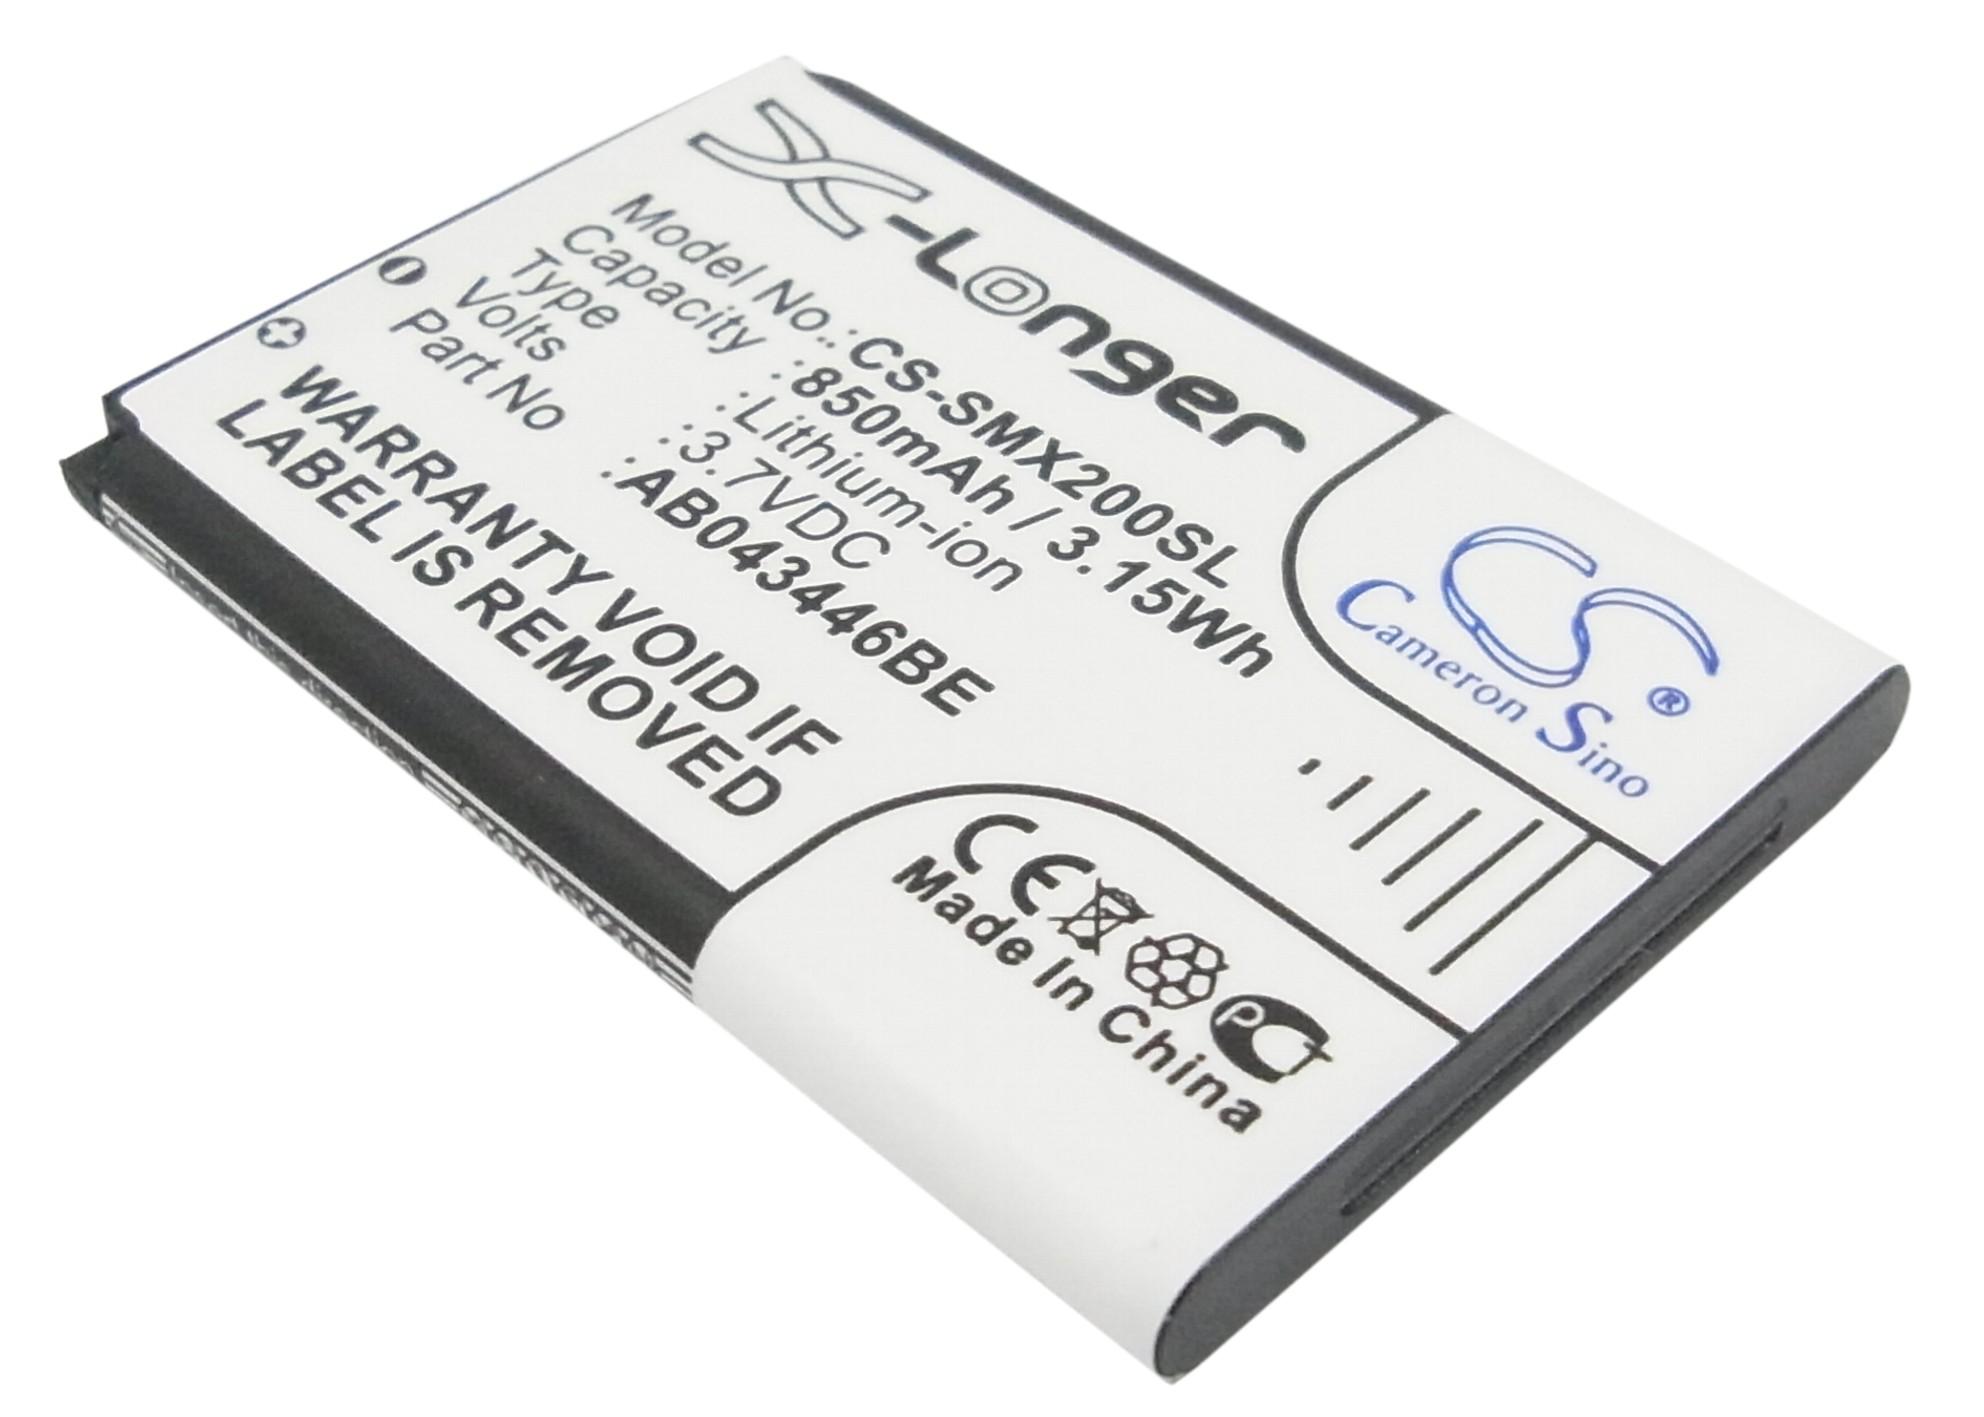 Cameron Sino baterie do mobilů pro SAMSUNG SGH-S401i 3.7V Li-ion 850mAh černá - neoriginální